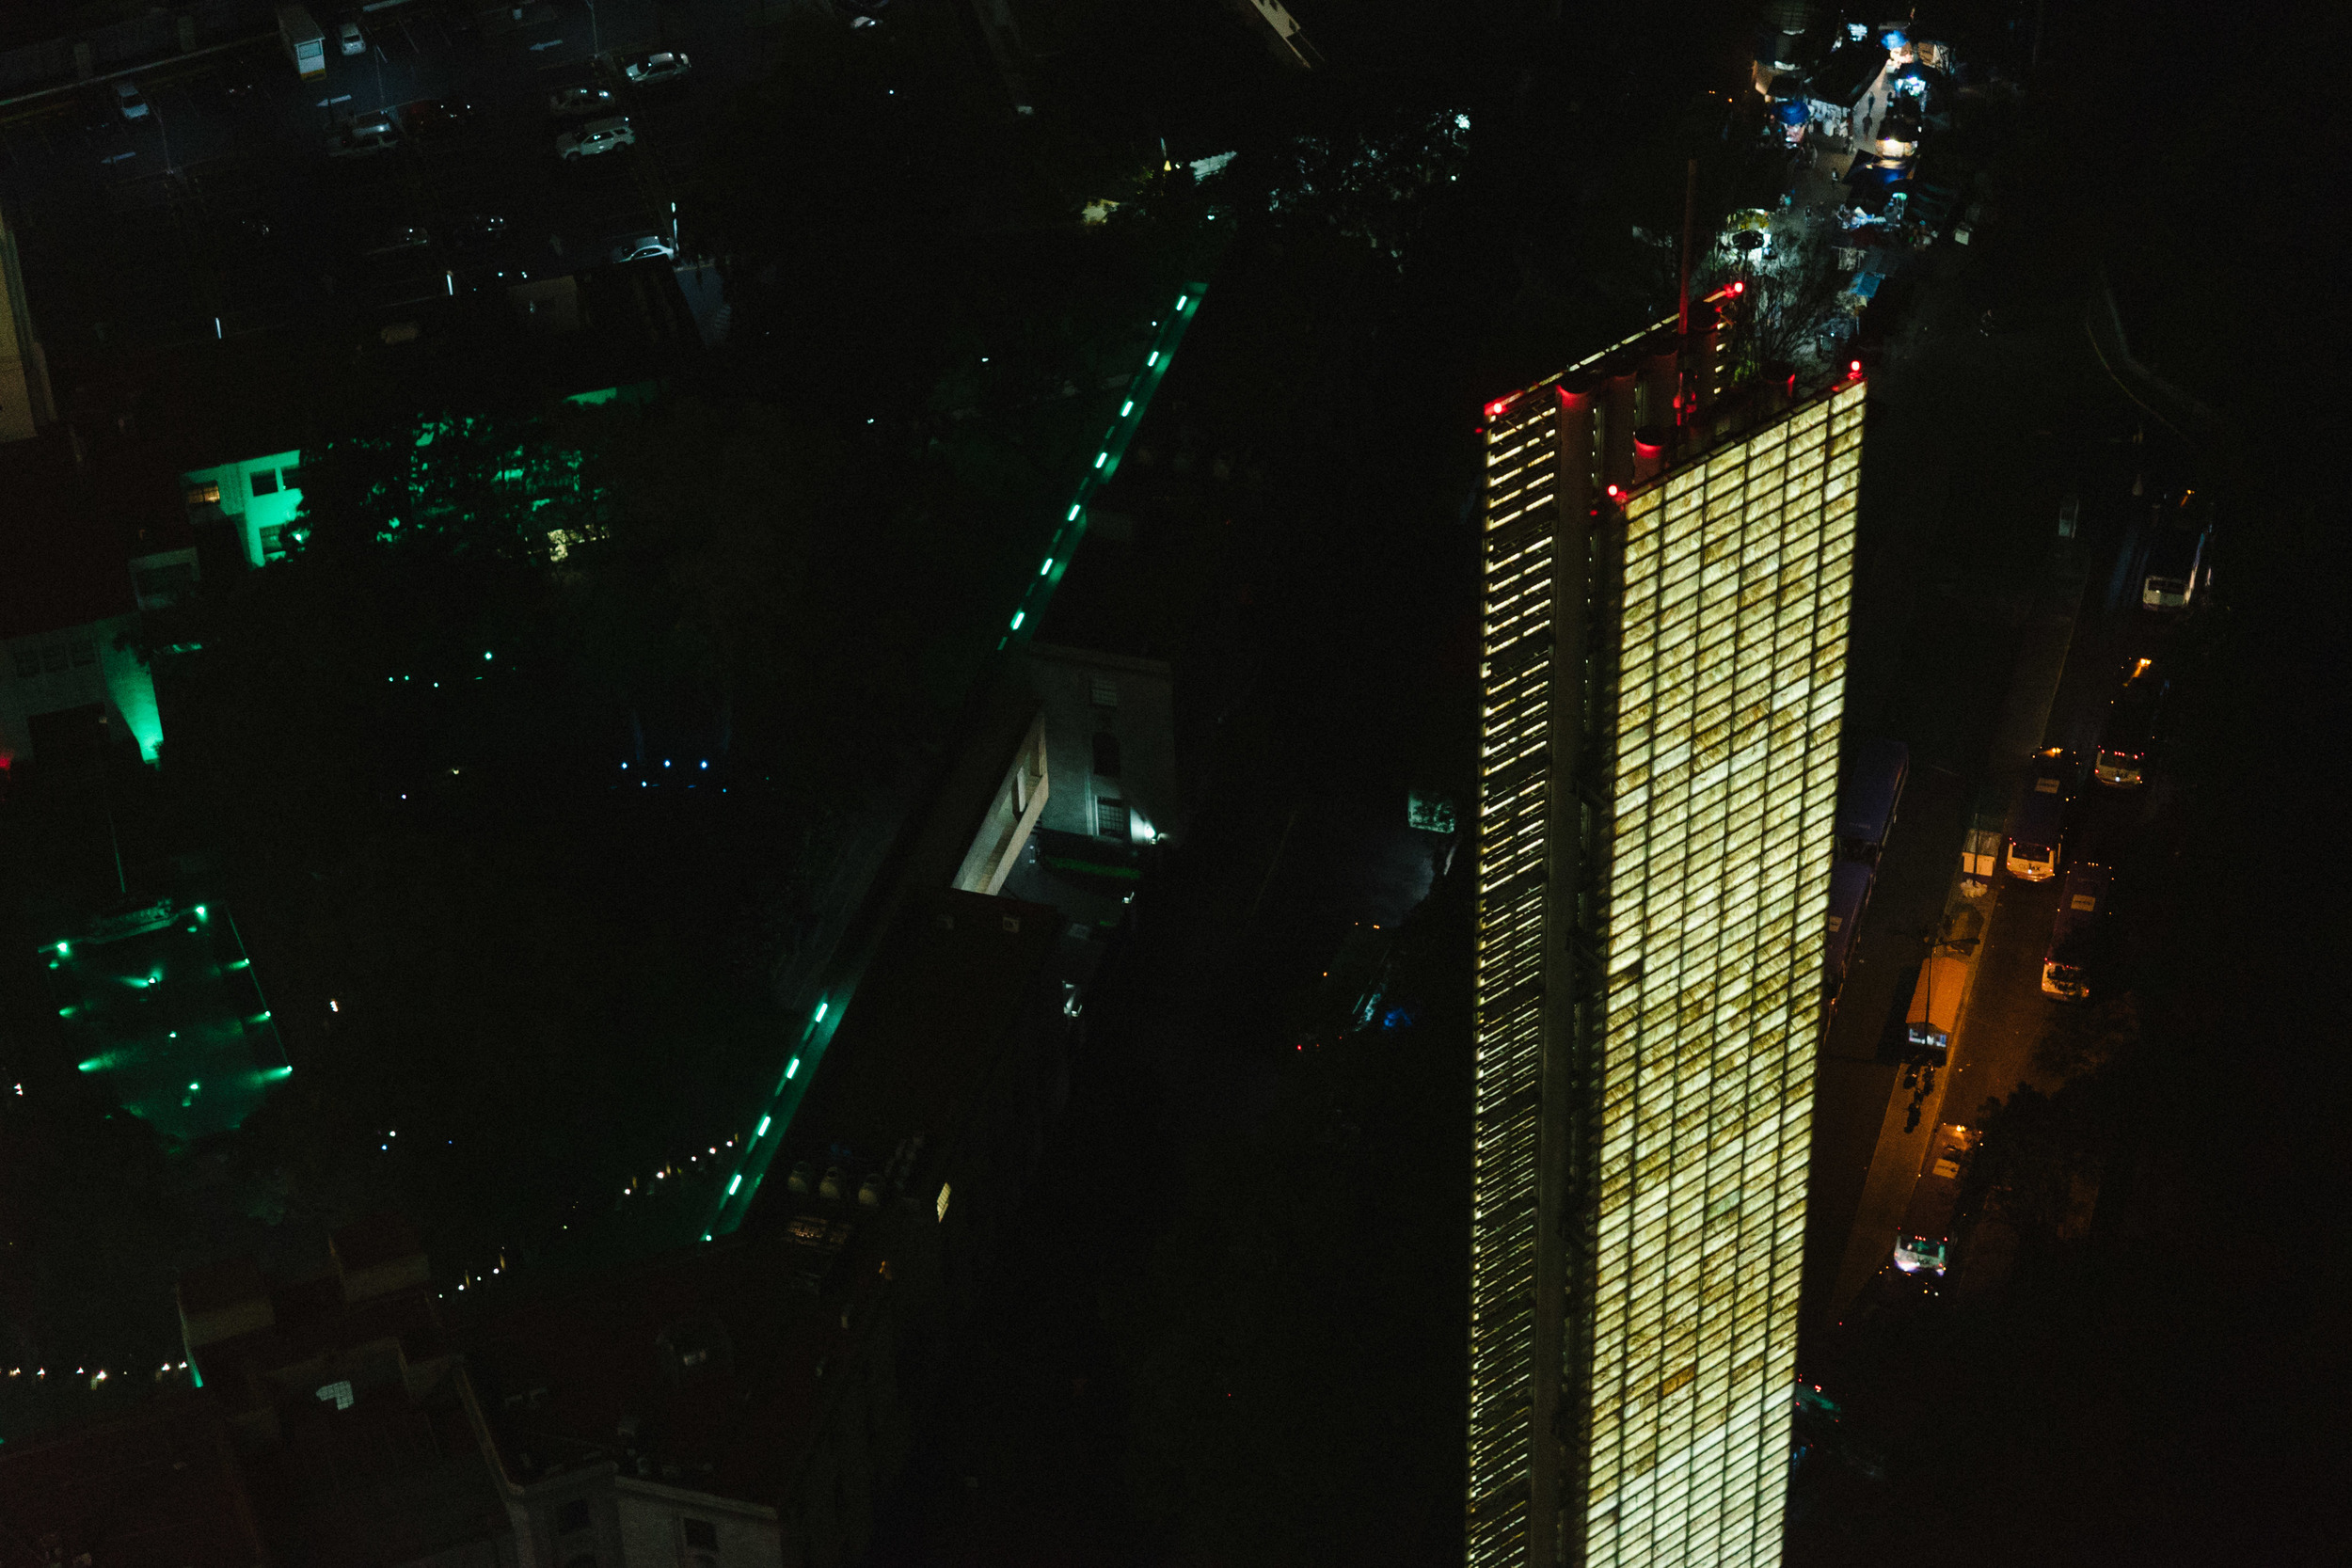 MaurizioSolisBroca.Photography-piso51-mexico-torre mayor-cdmx-20151128DSC01403-Edit.jpg